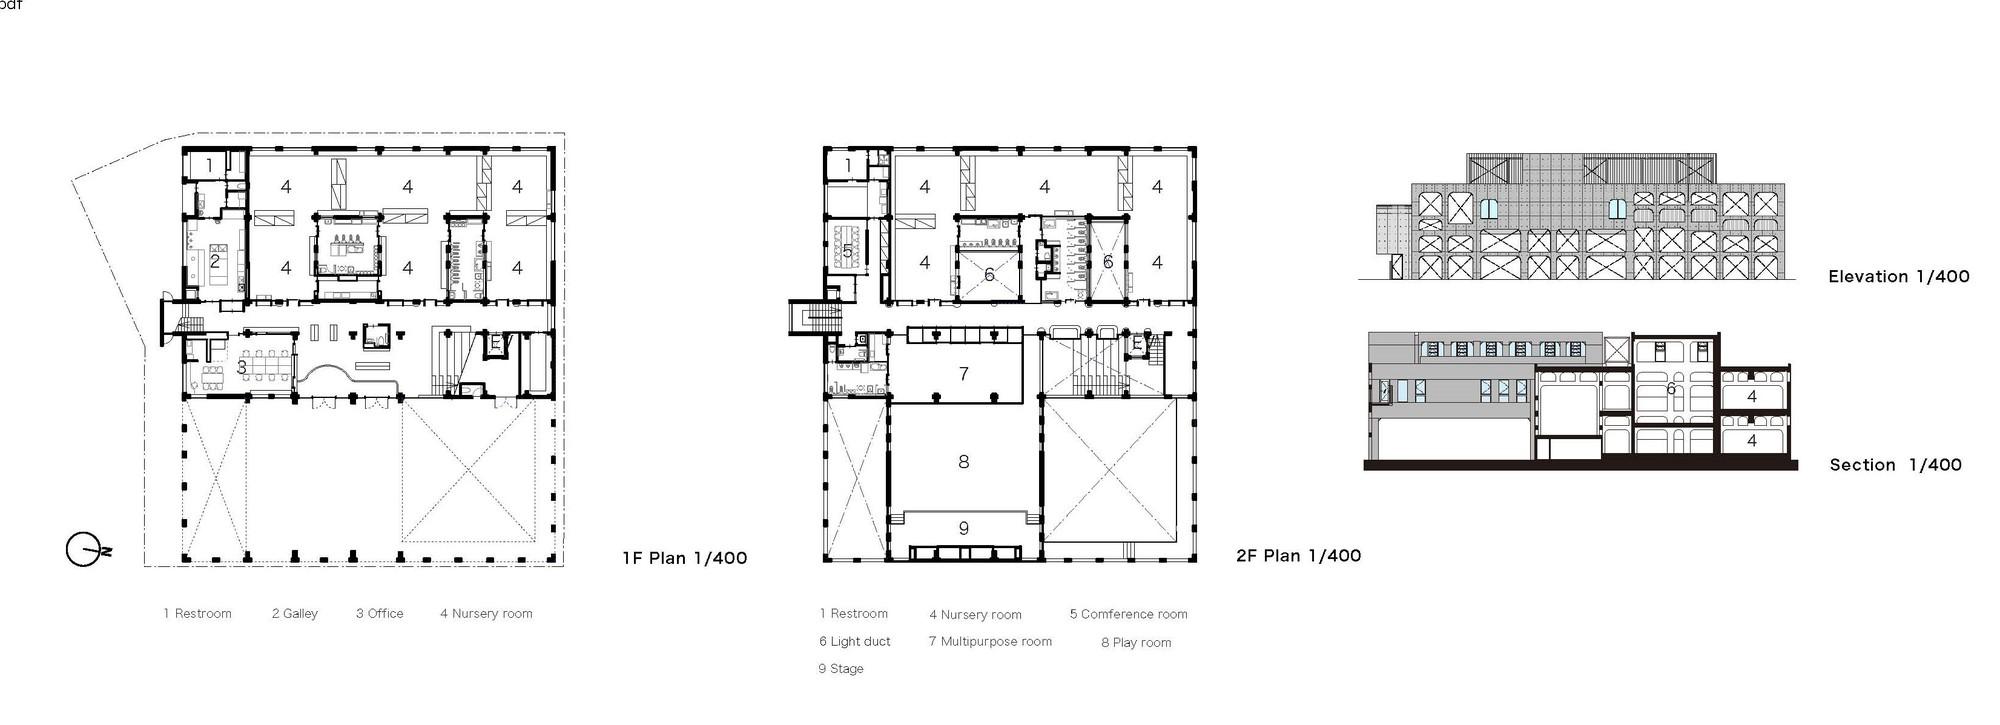 Good Floor Plan u Elevation